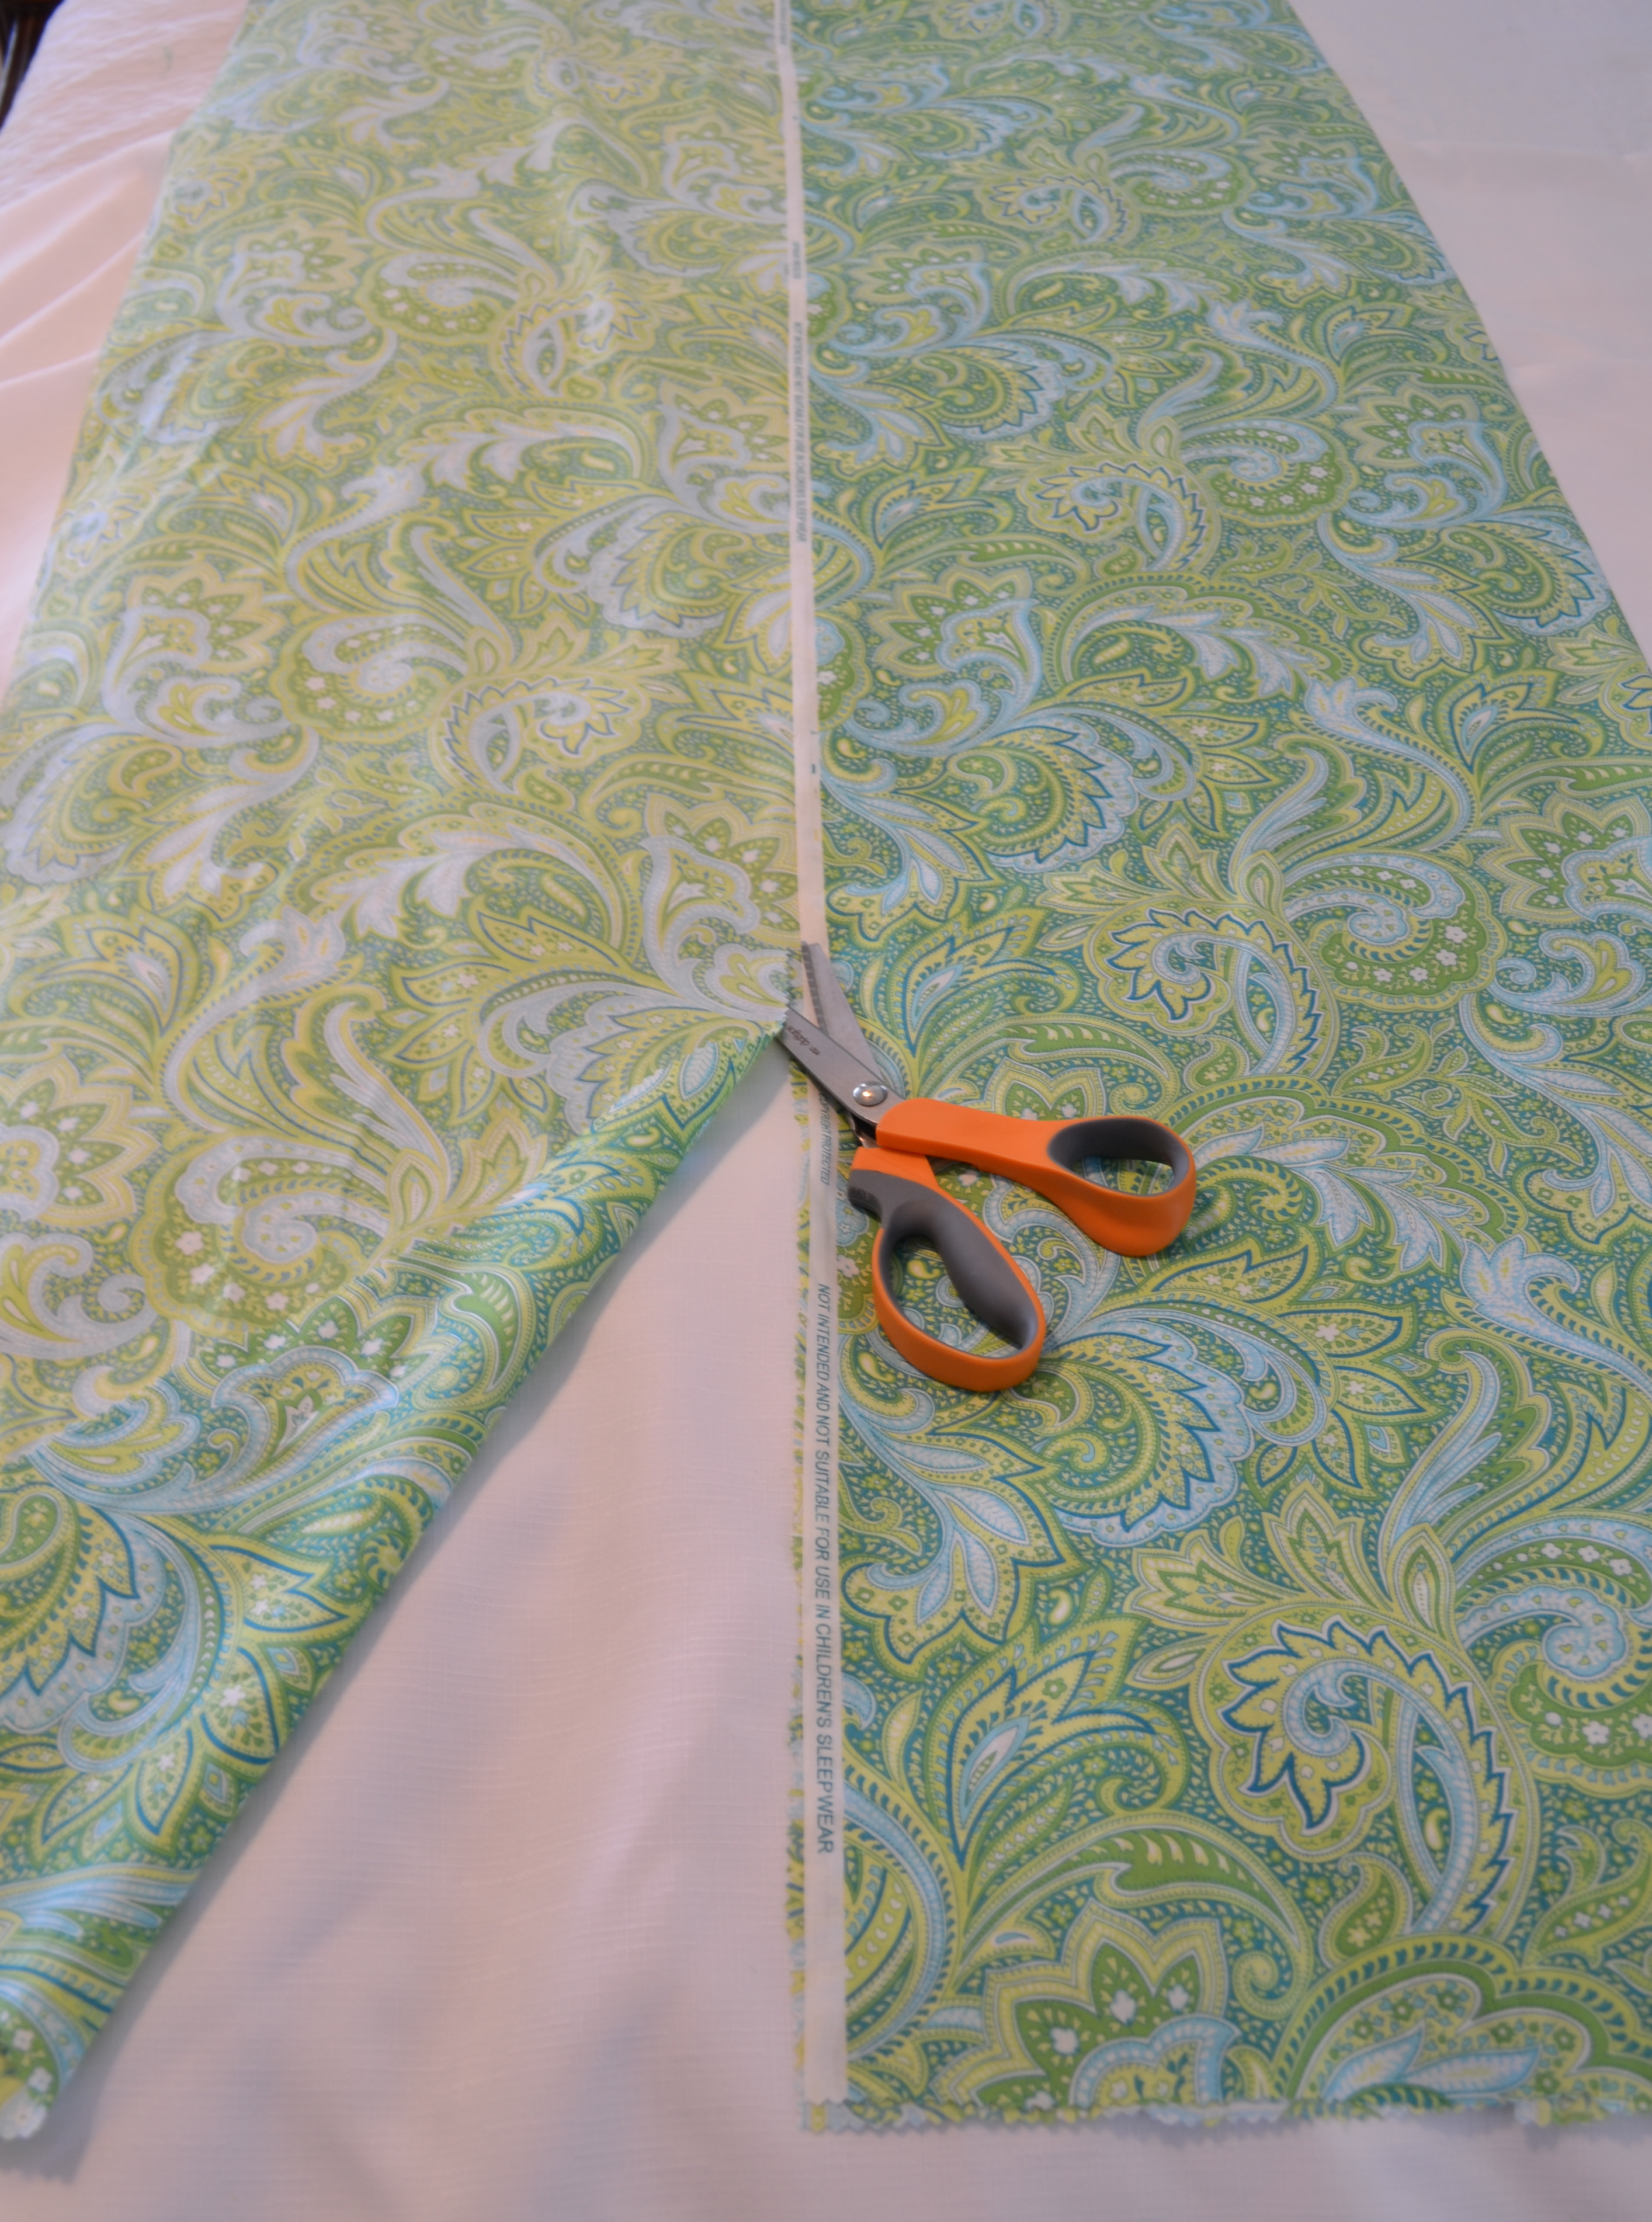 High Quality DIY Fabric Table Runner | Handmade Fabric Table Runner | Table Runner Ideas  | DIY No